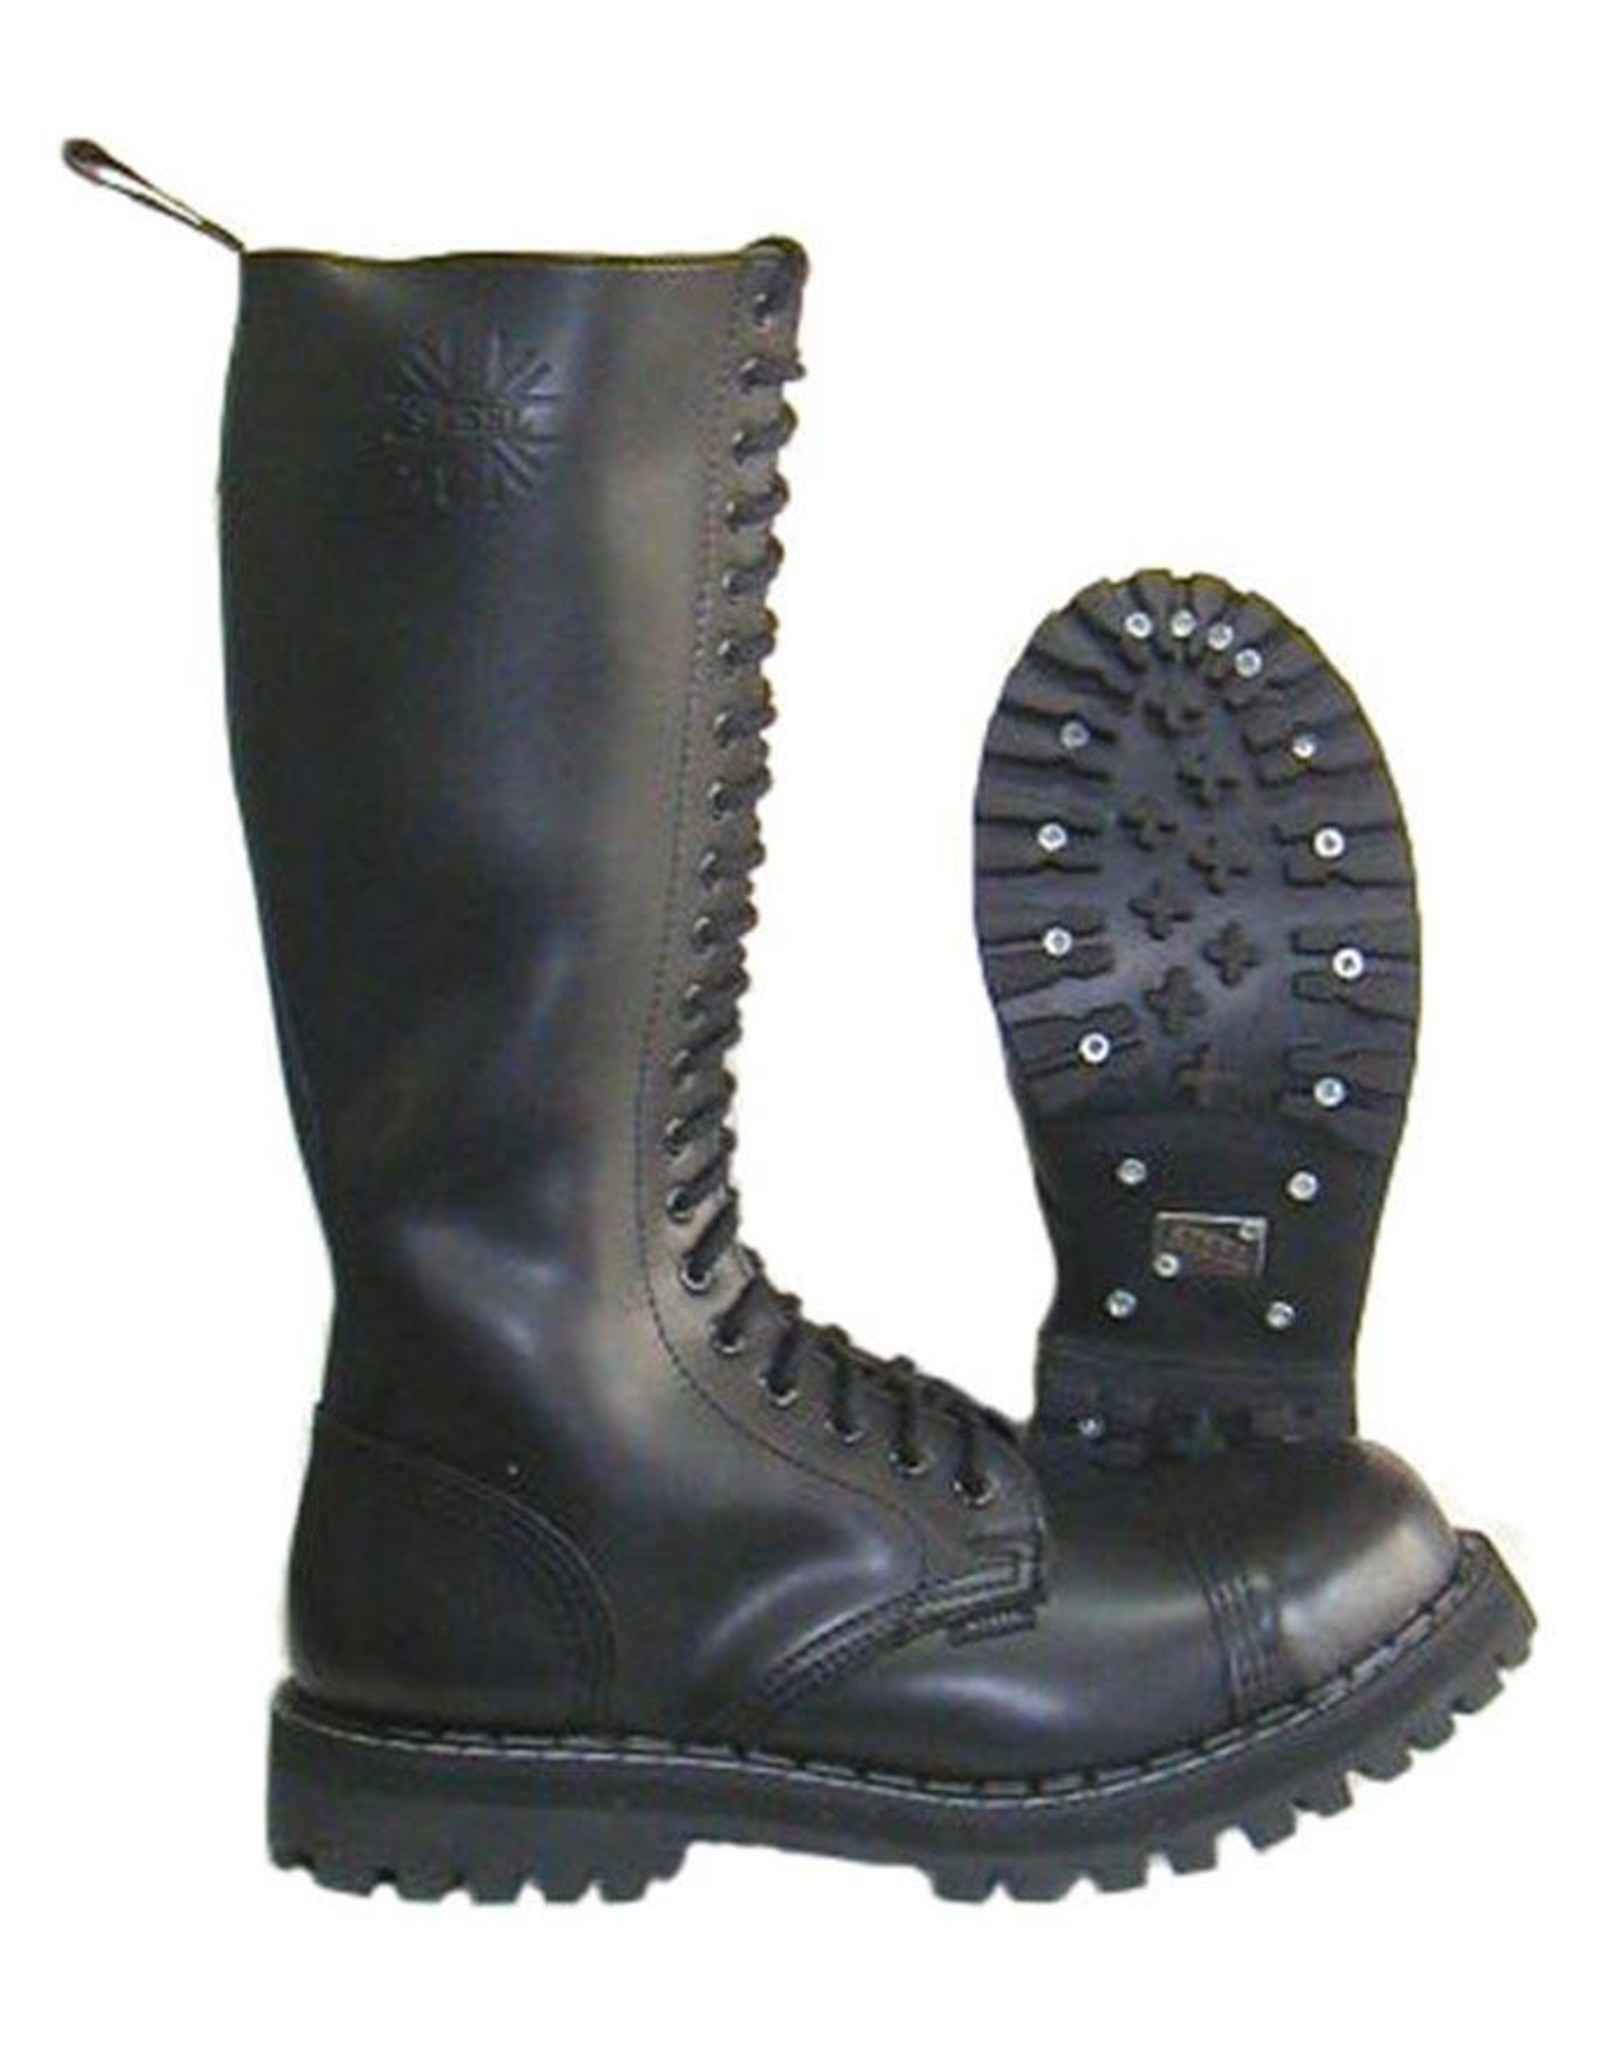 STEEL BOOT 20 EYELETS BLACK CAP S2000B